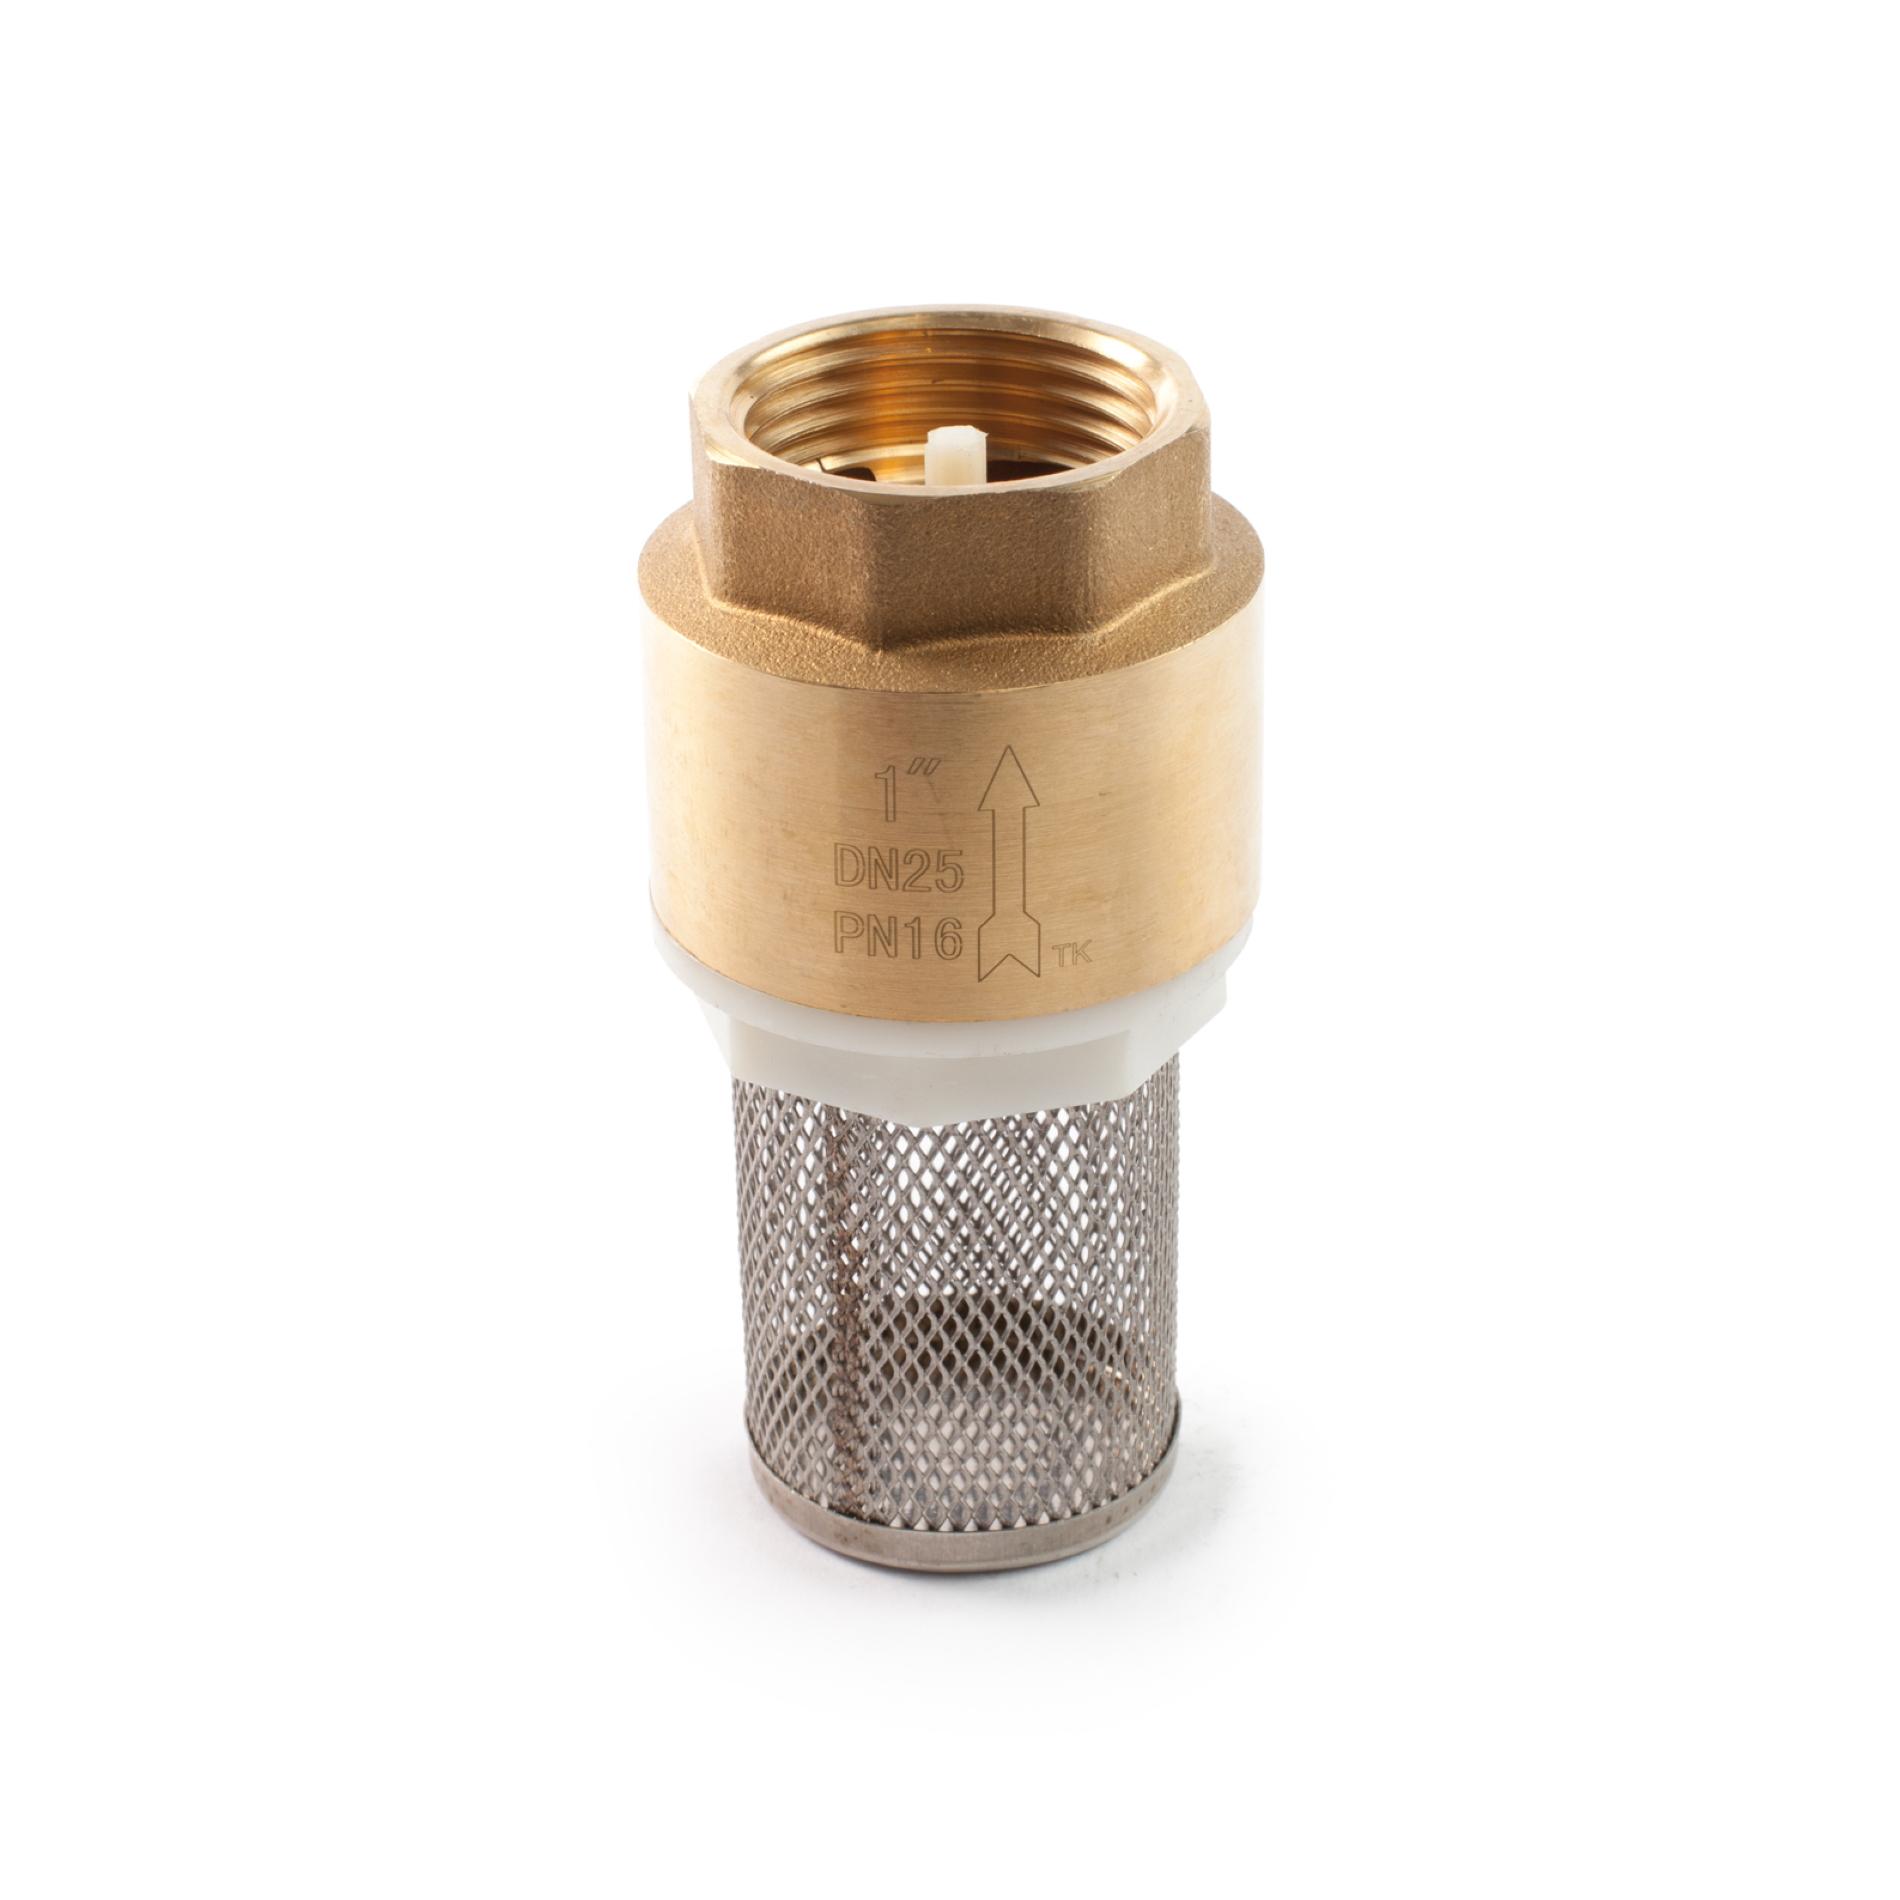 477 Valvola fondo ottone succhieruola acciaio inox incorporata Brass foot valve non-detachable stainless steel strainer